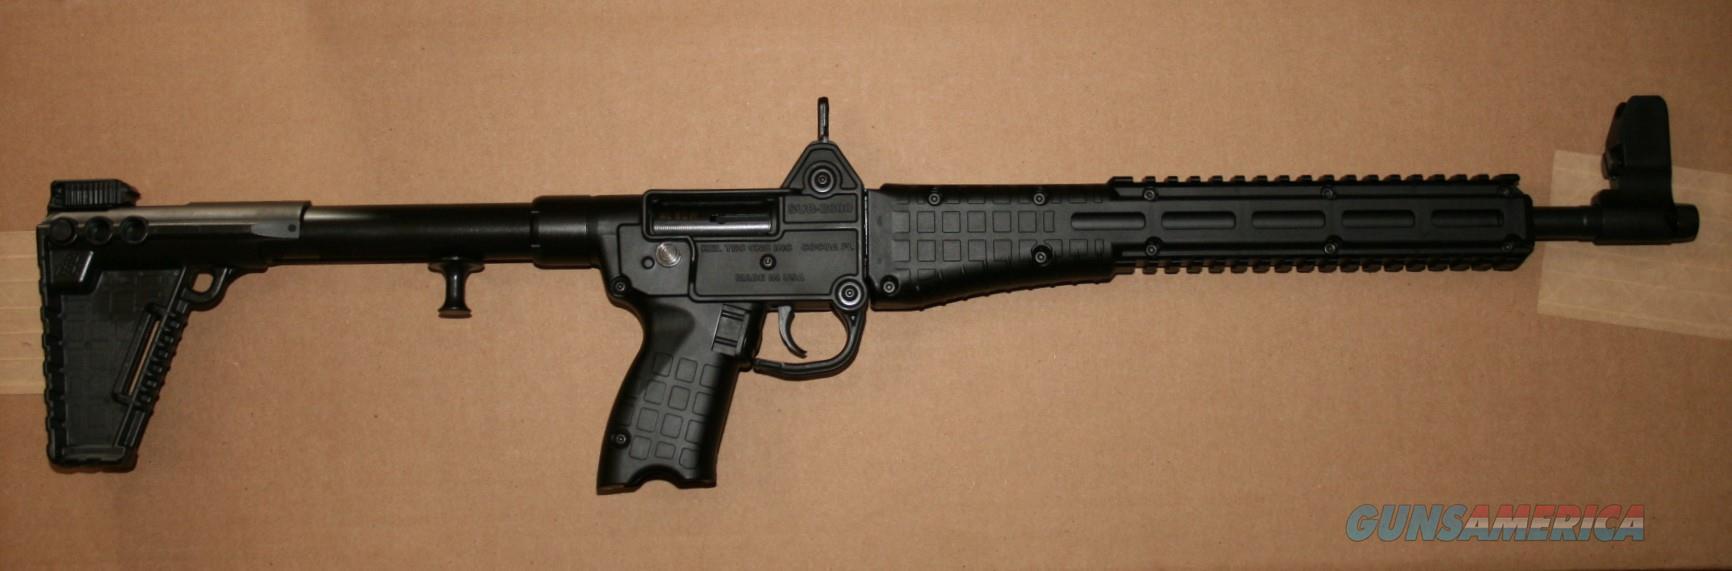 "Kel-Tec SUB-2000 Gen 2 9mm 16.25"" TB Glk 17  Guns > Rifles > Kel-Tec Rifles"